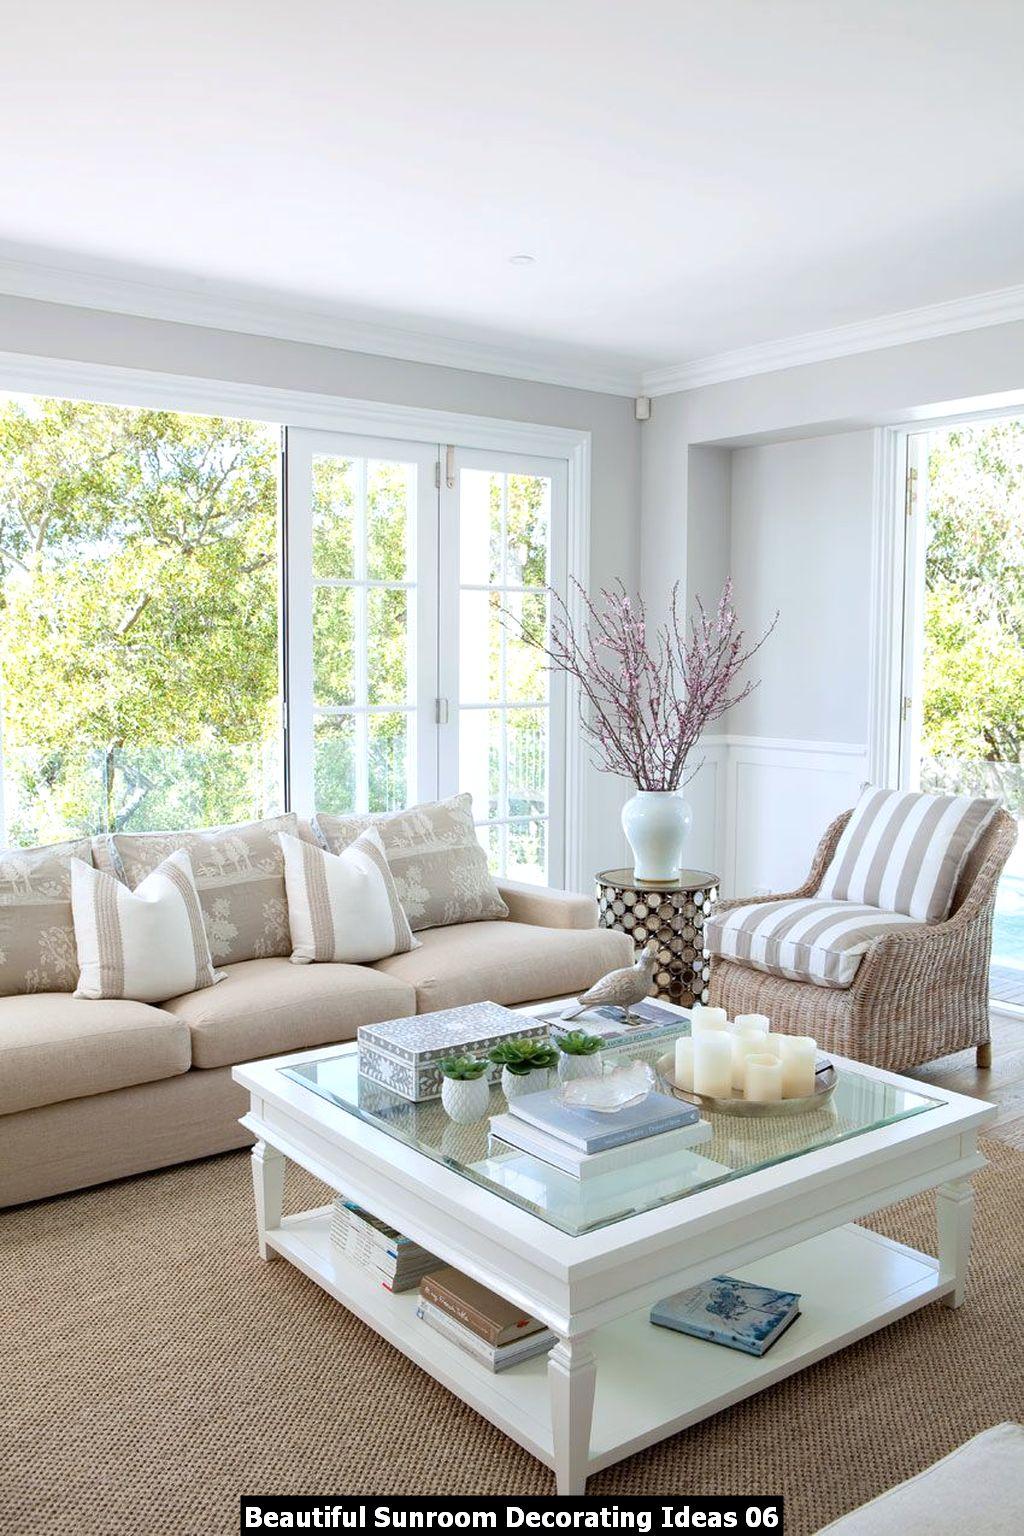 Beautiful Sunroom Decorating Ideas 06